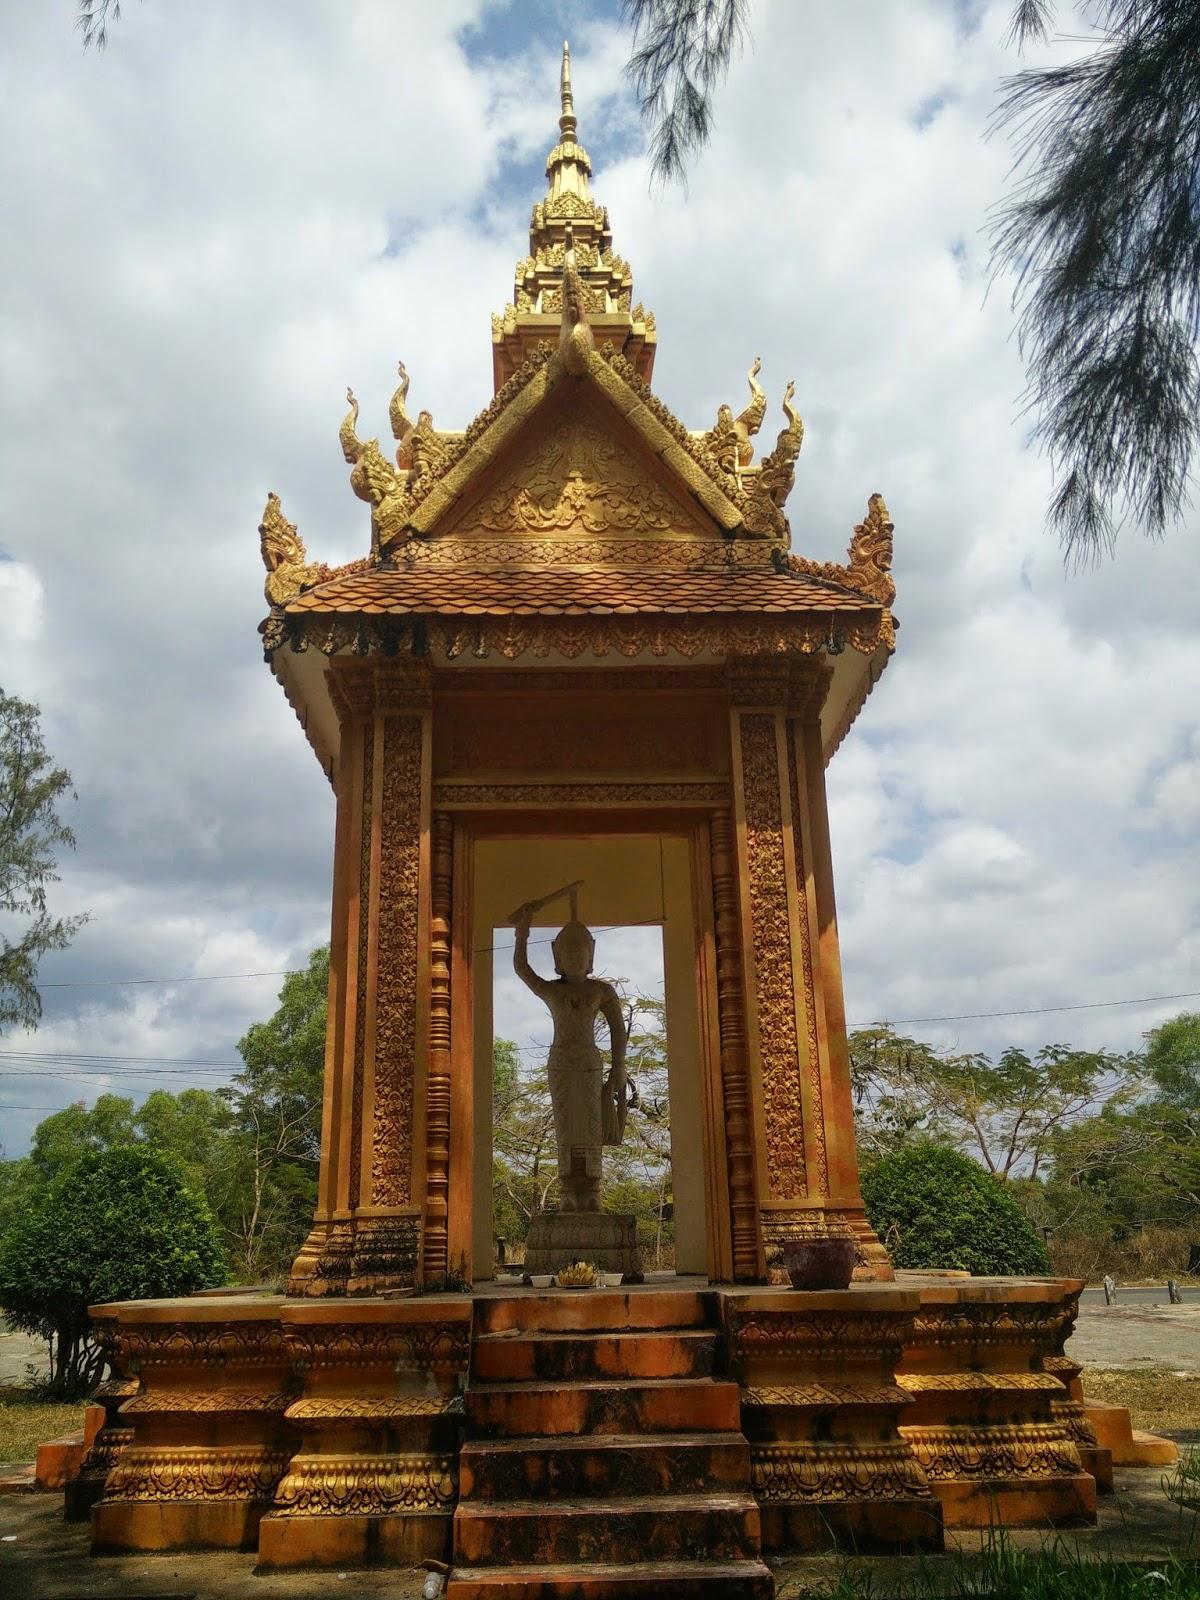 Камбоджа экскурсии фото